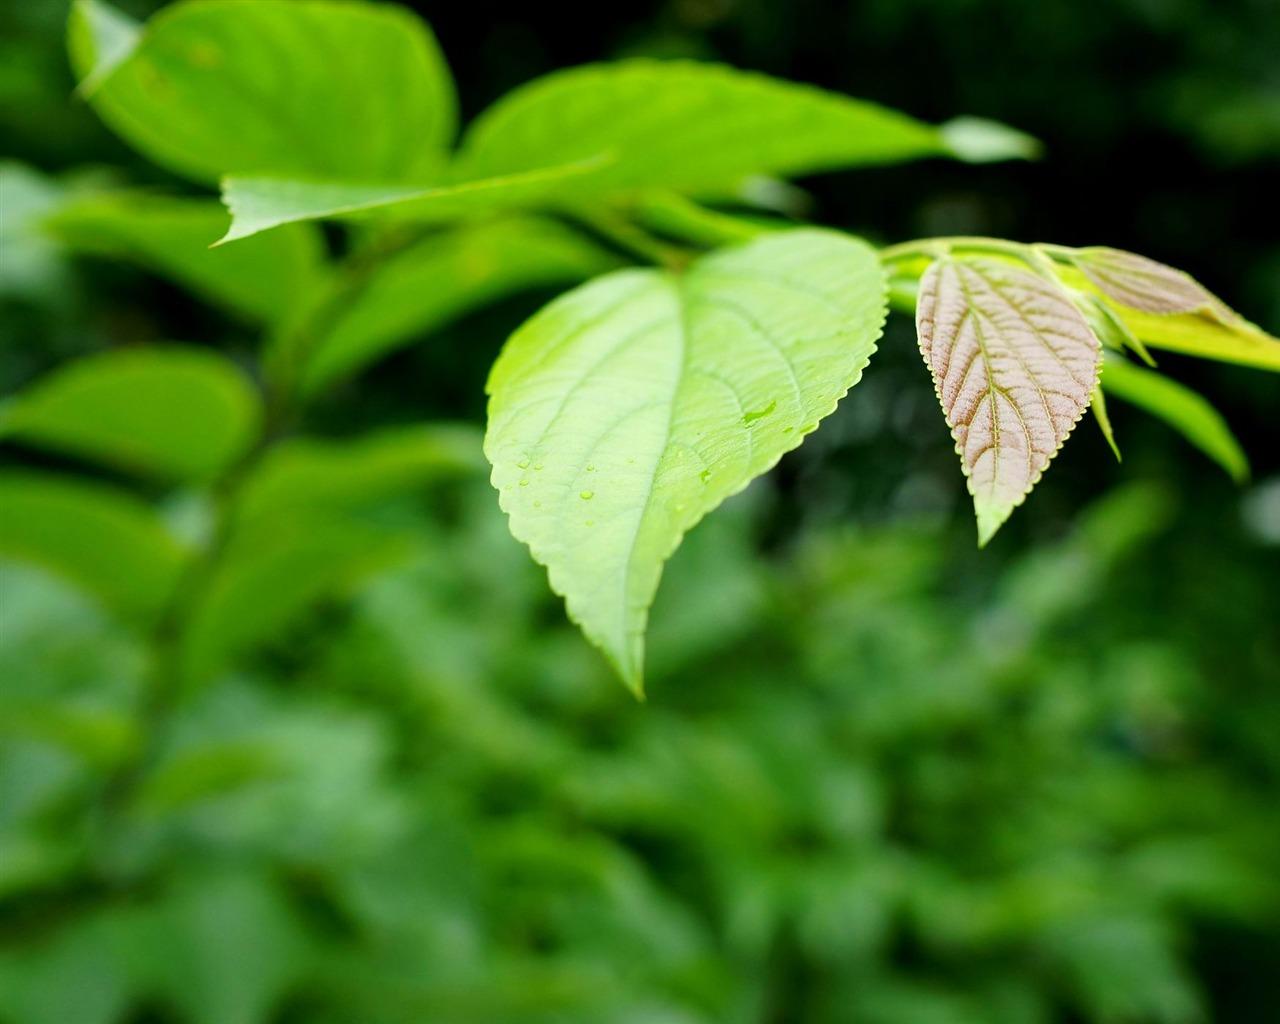 Fresh Green Leaves Hd Plant Desktop Wallpaper 07 Preview 10wallpaper Com